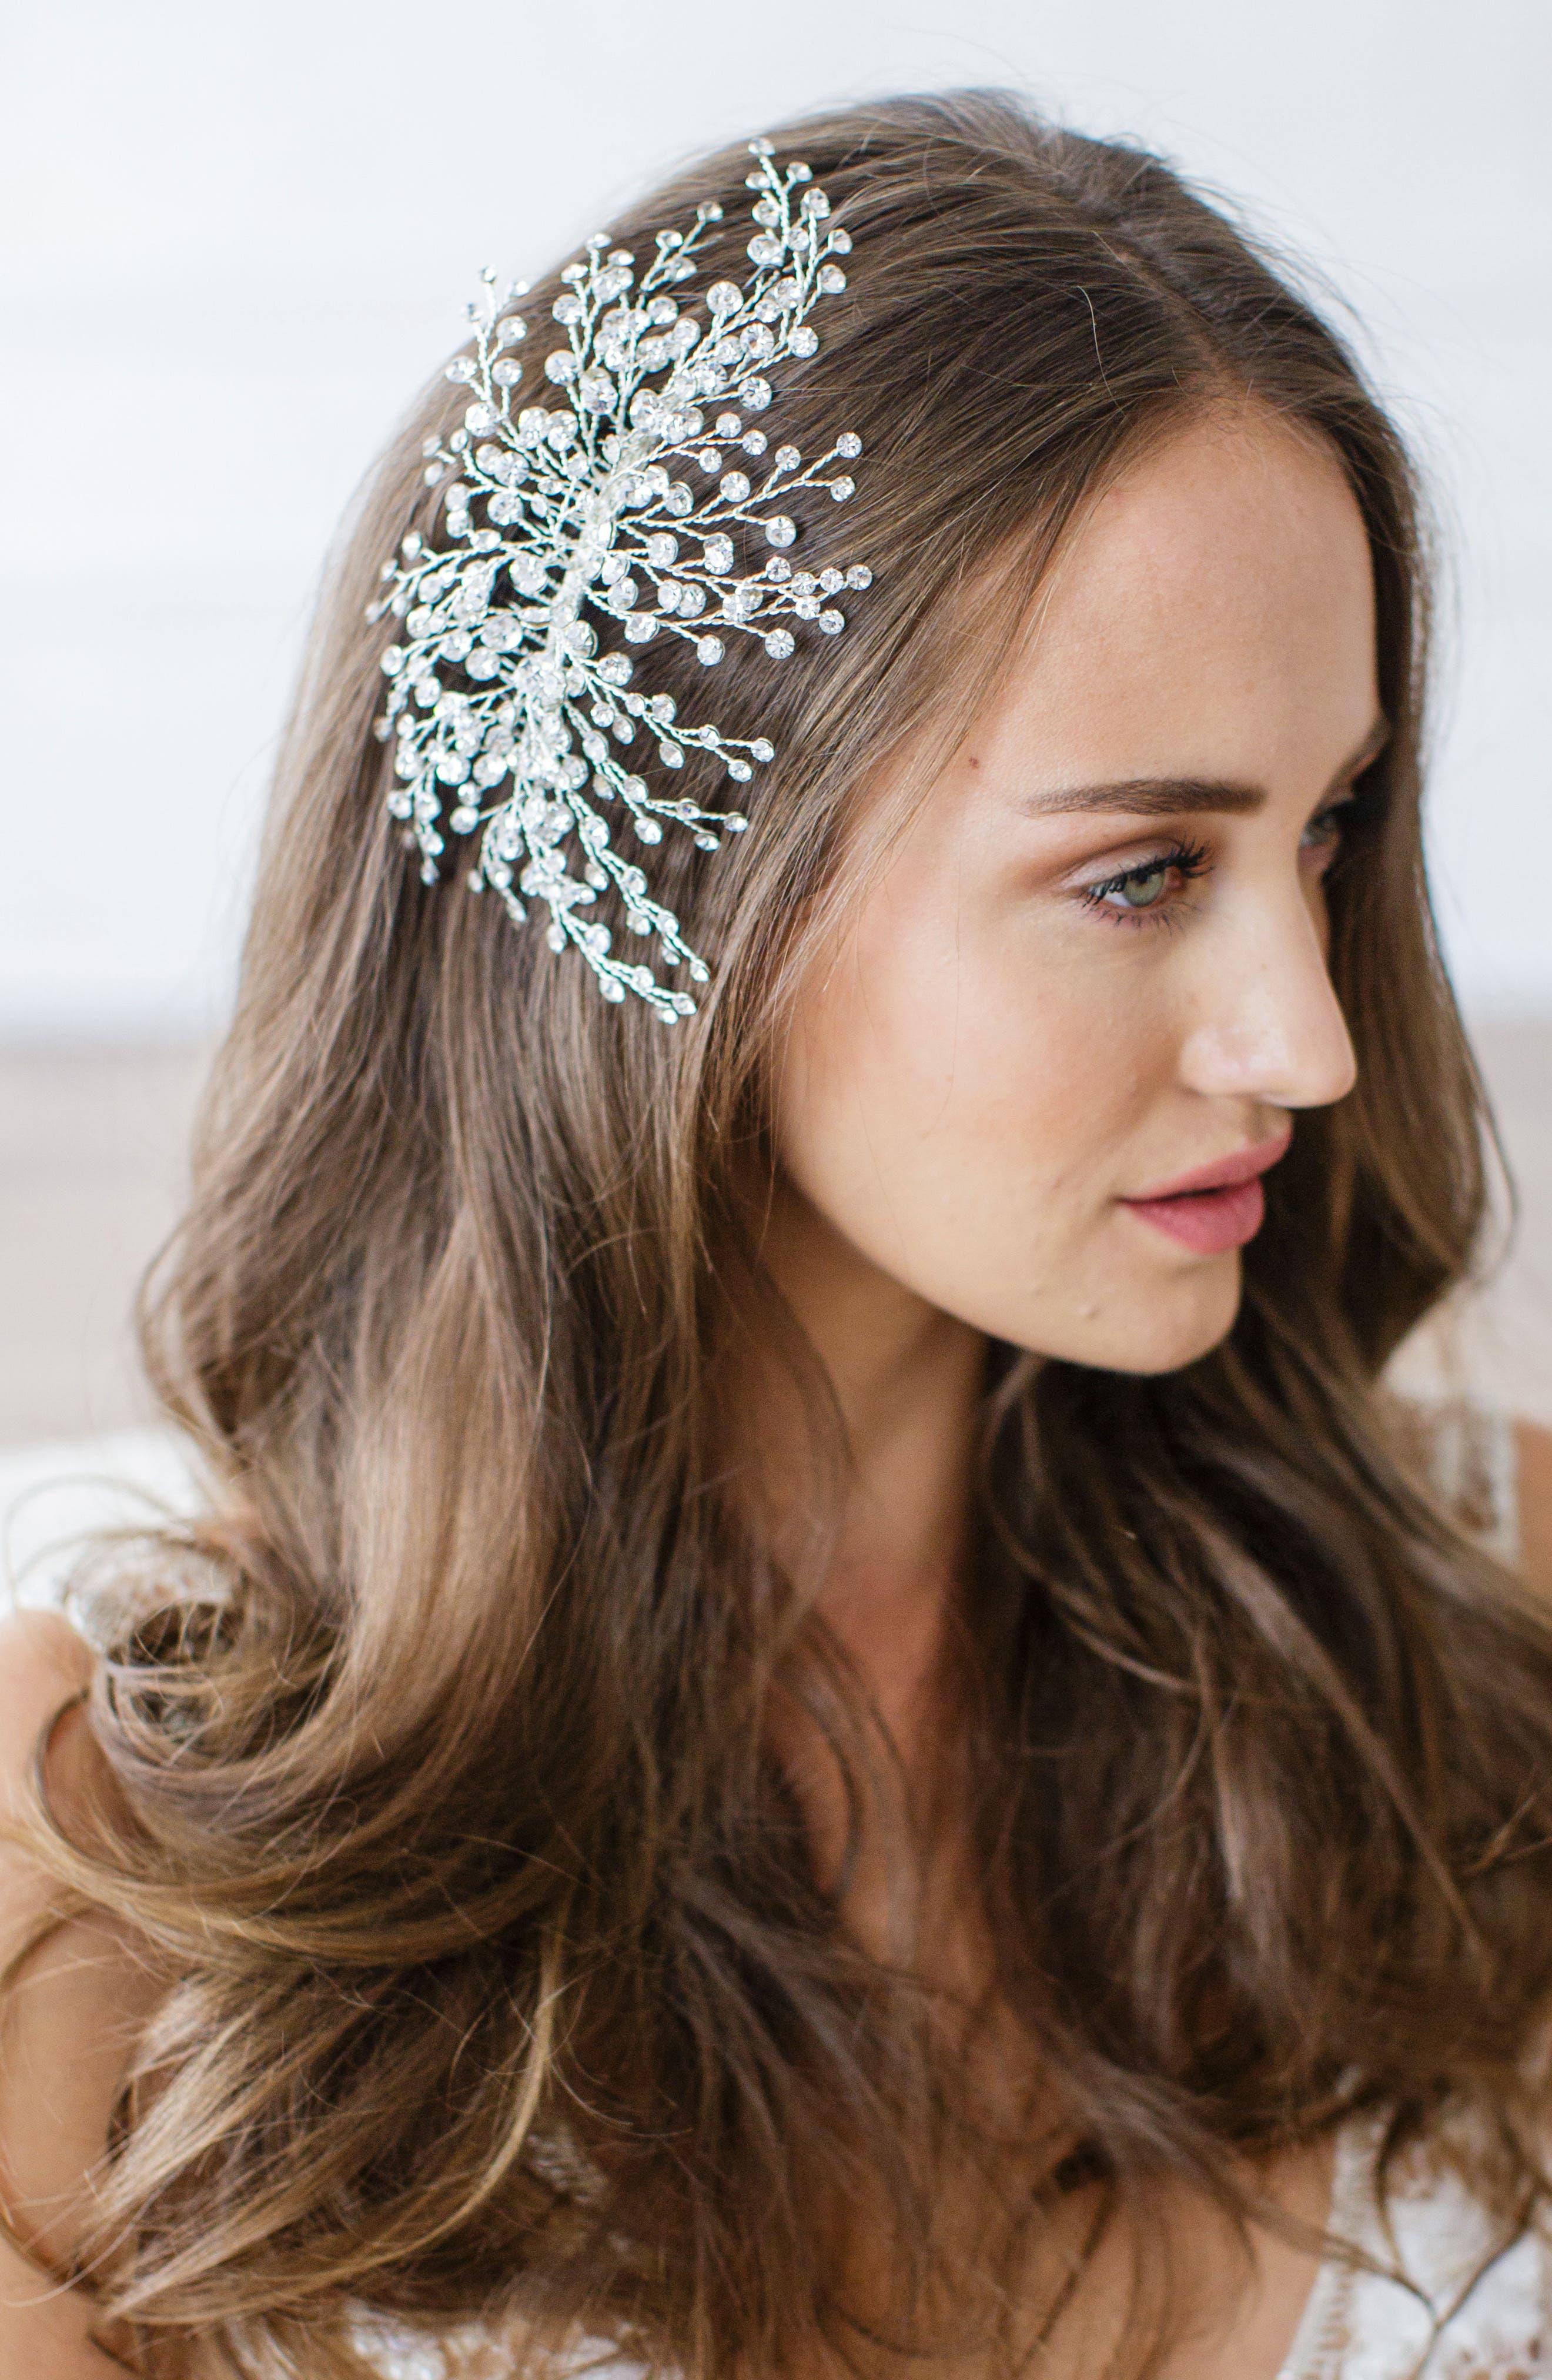 Alternate Image 1 Selected - Brides & Hairpins 'Veda' Crystal Embellished Hair Comb